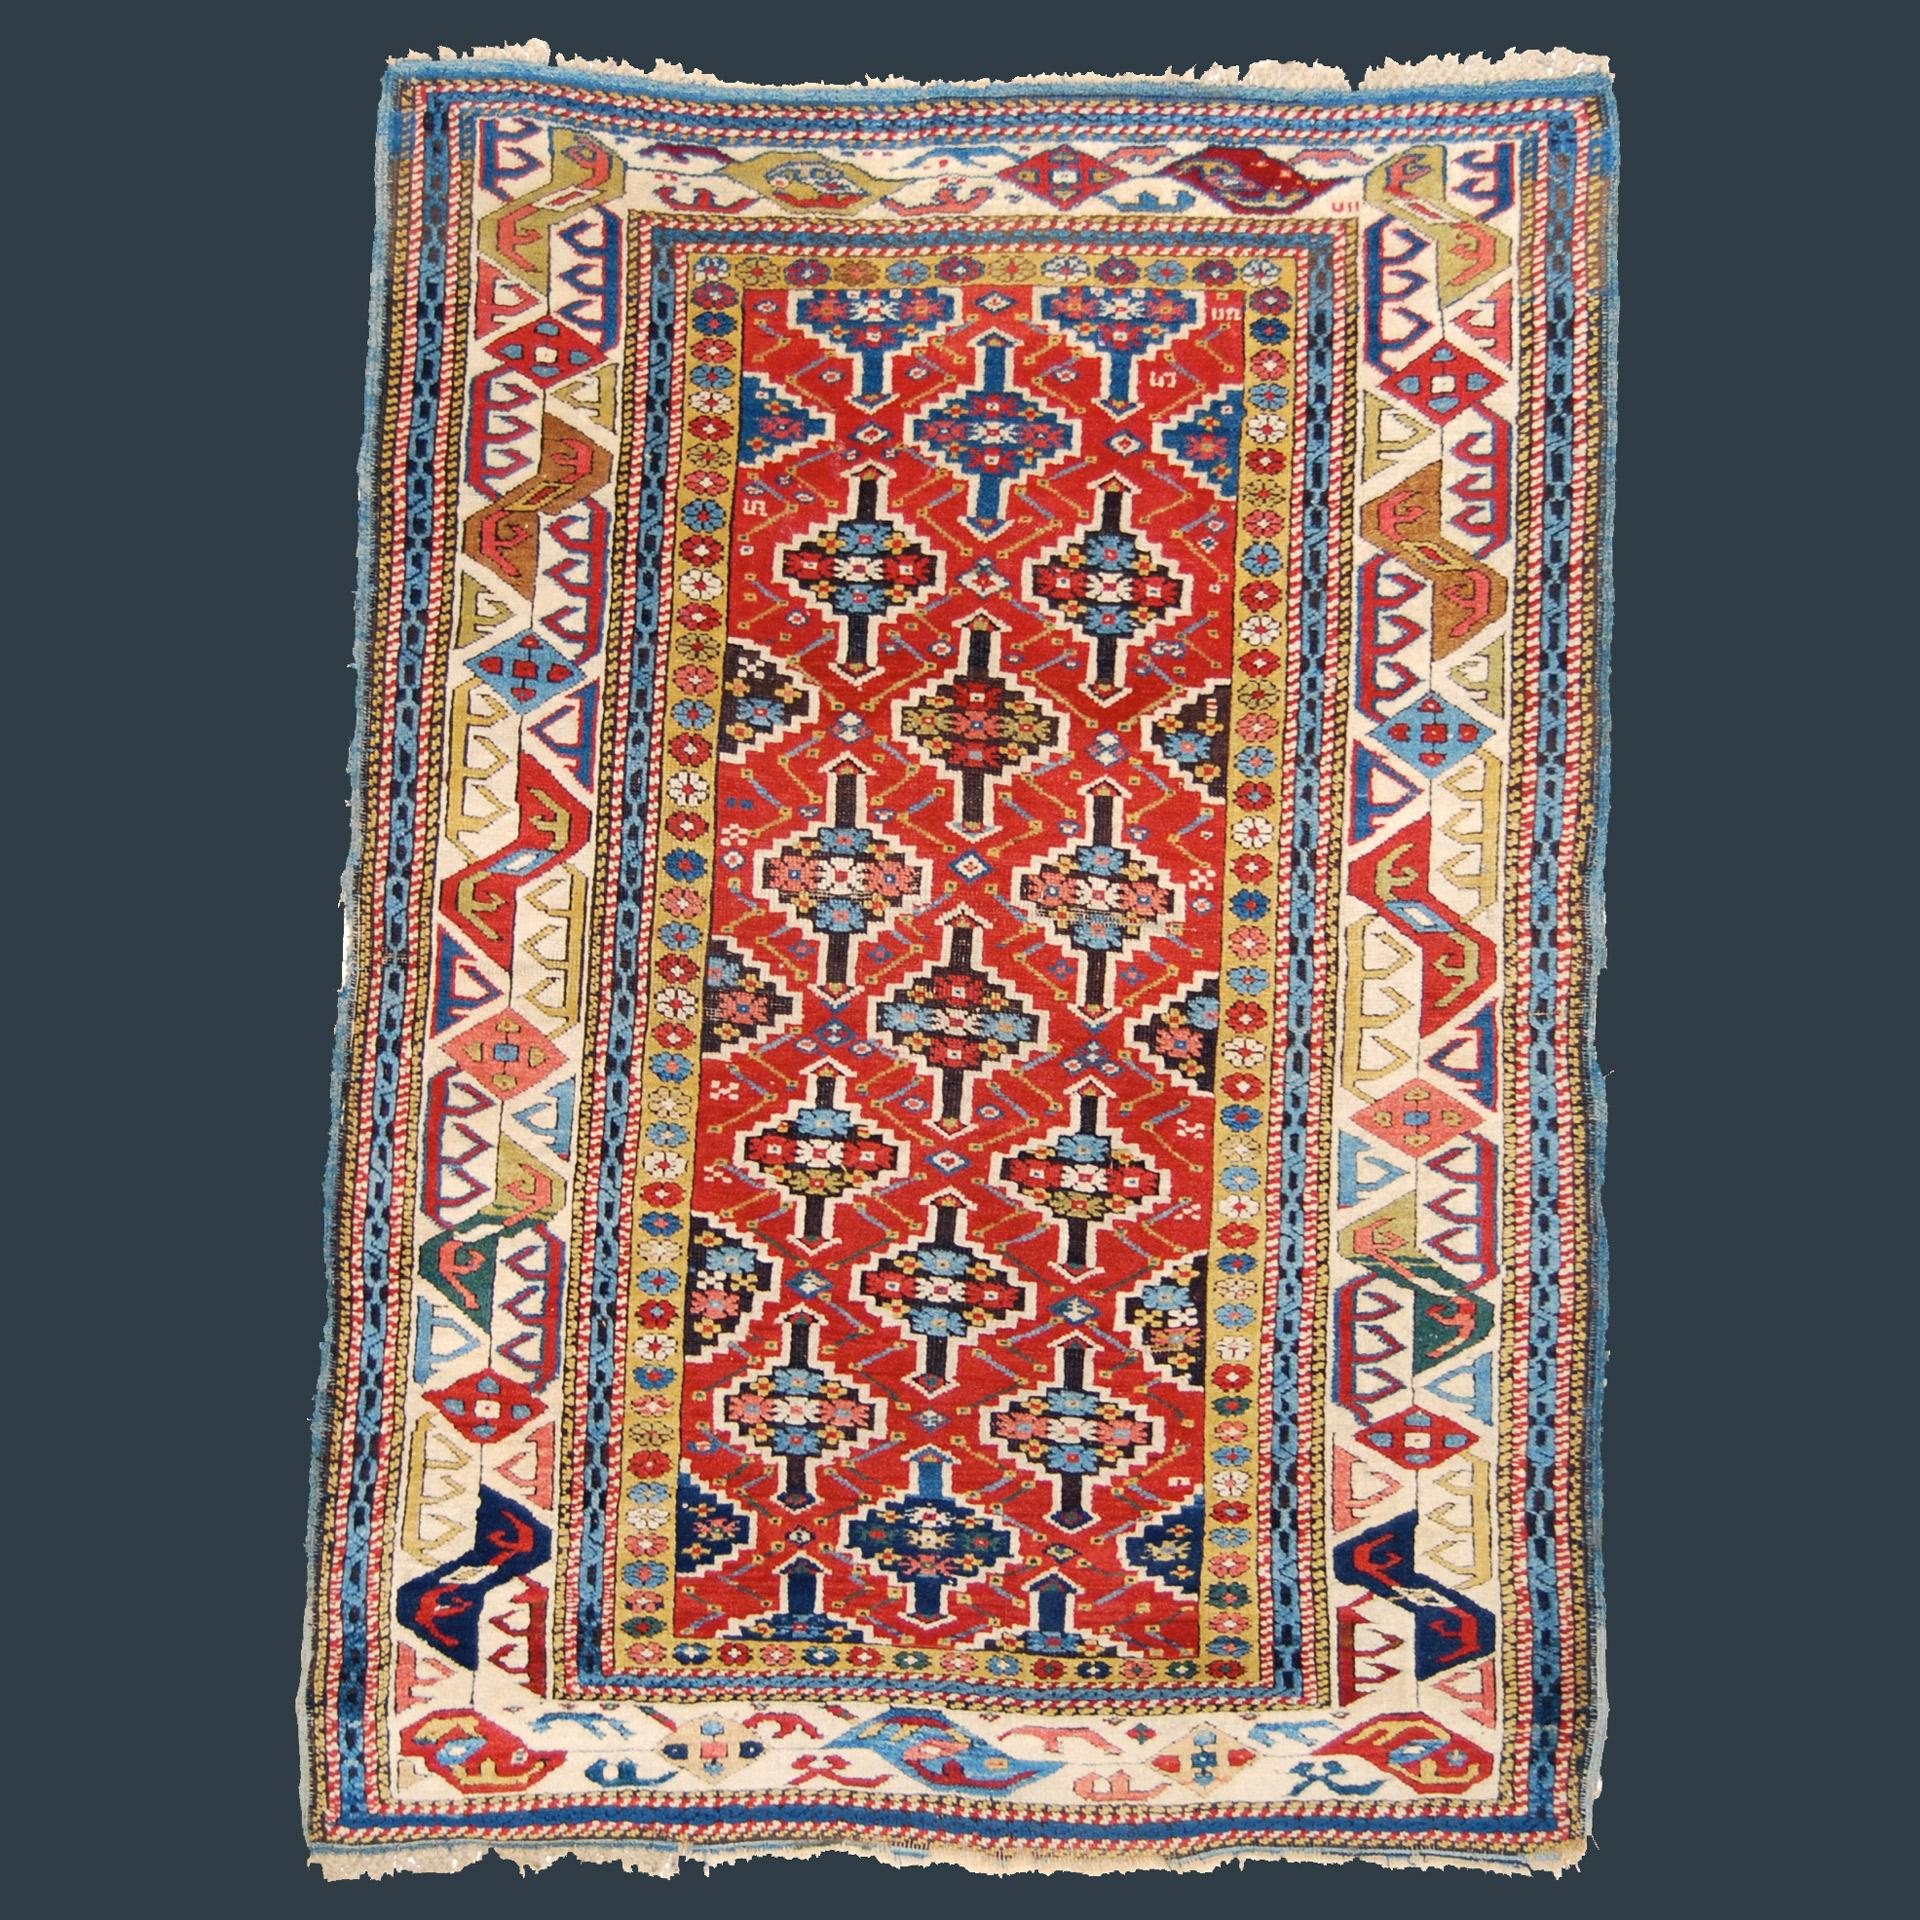 An important 19th century antique Caucasian Kuba rug